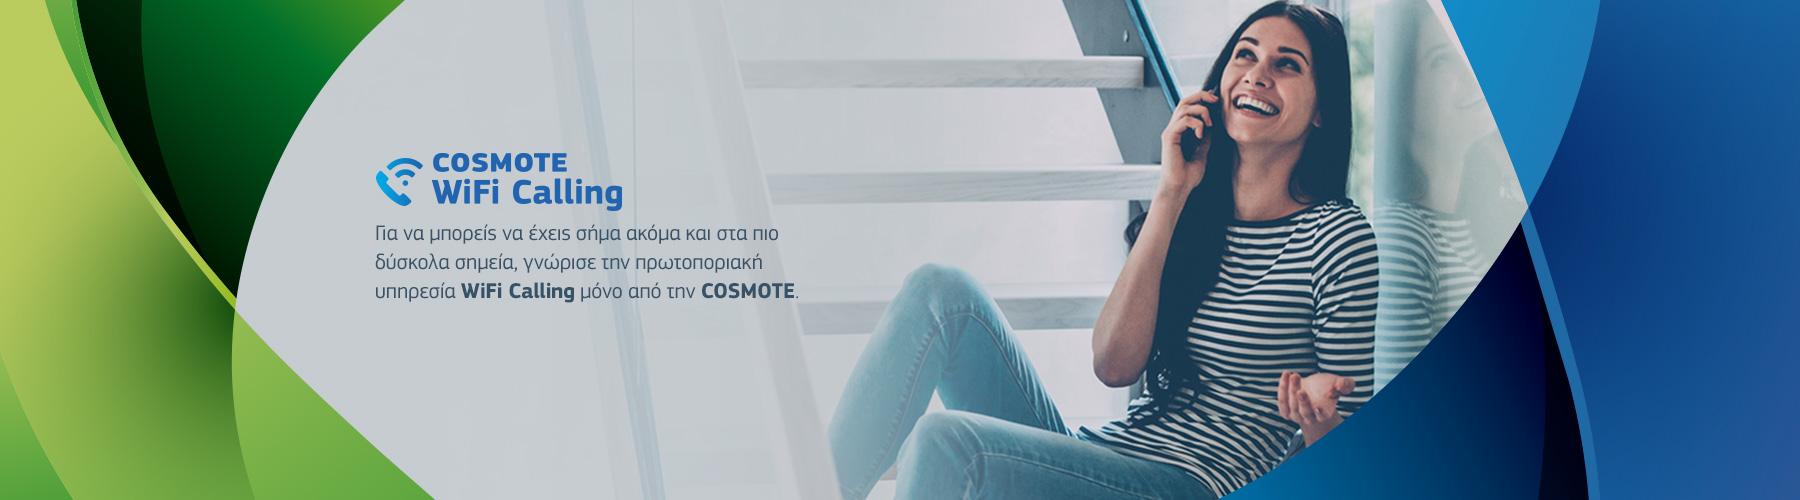 COSMOTE WiFi Calling